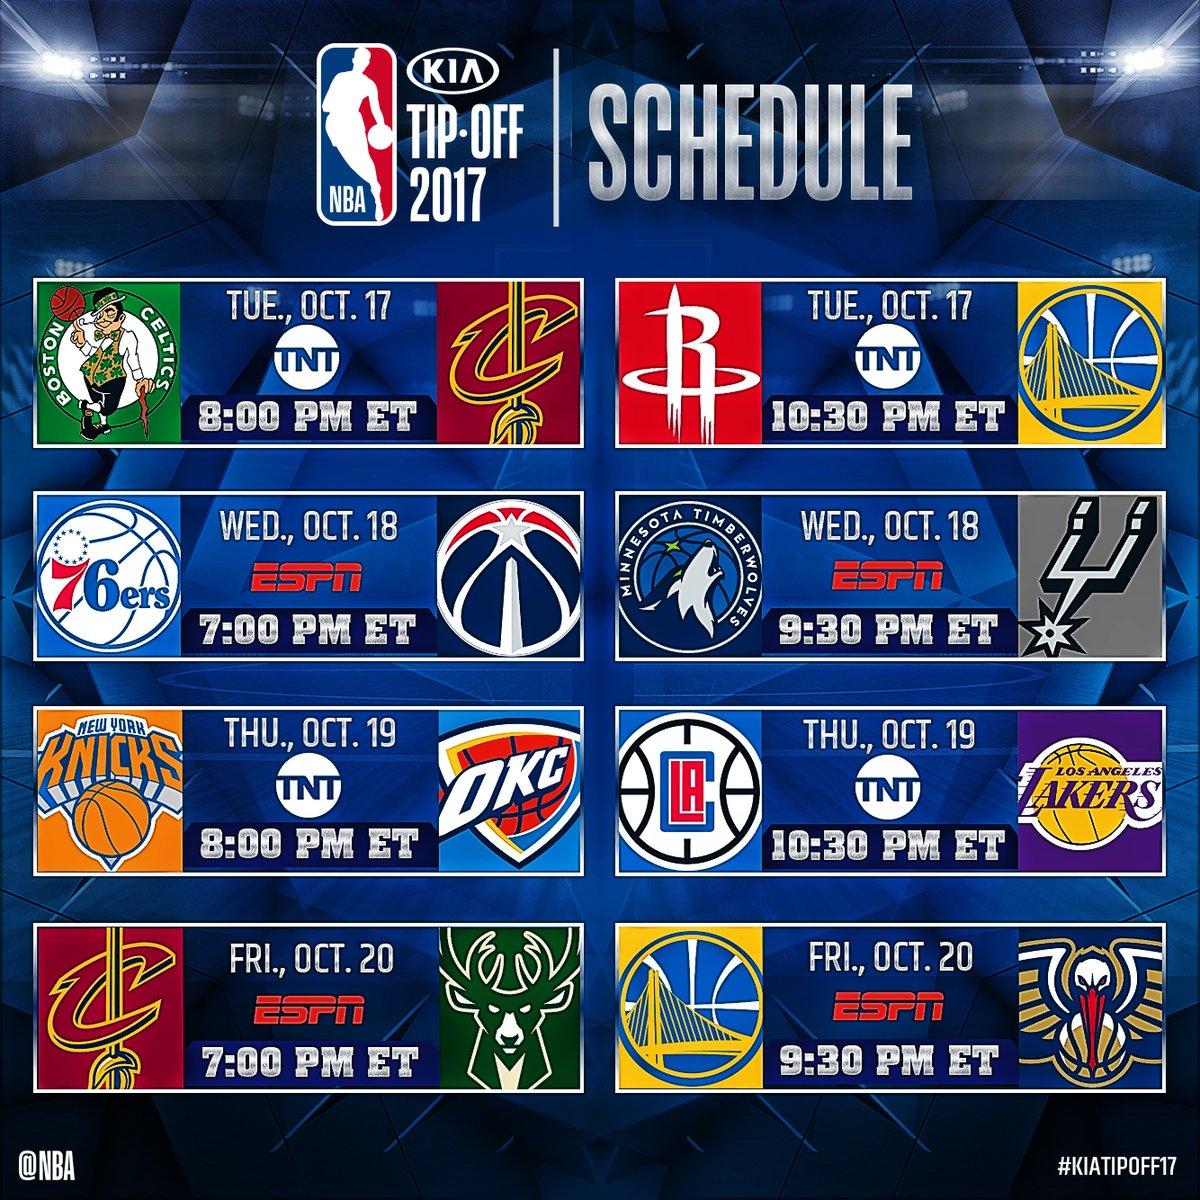 Warriors Vs Rockets Lineup: SpanishÑBA (@Spanish_NBA)